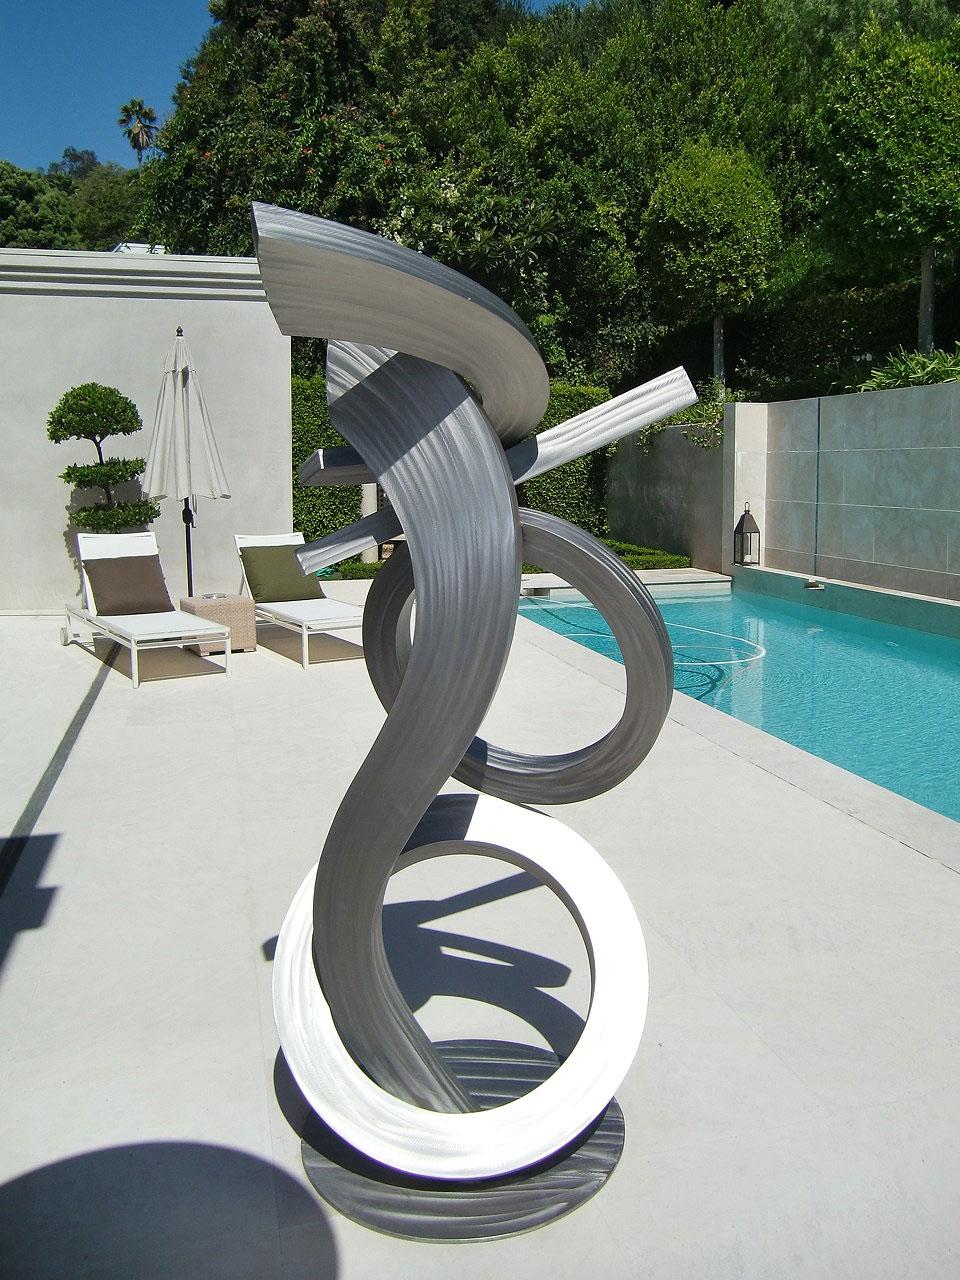 Brad Howe Stainless Steel Outdoor Sculpture